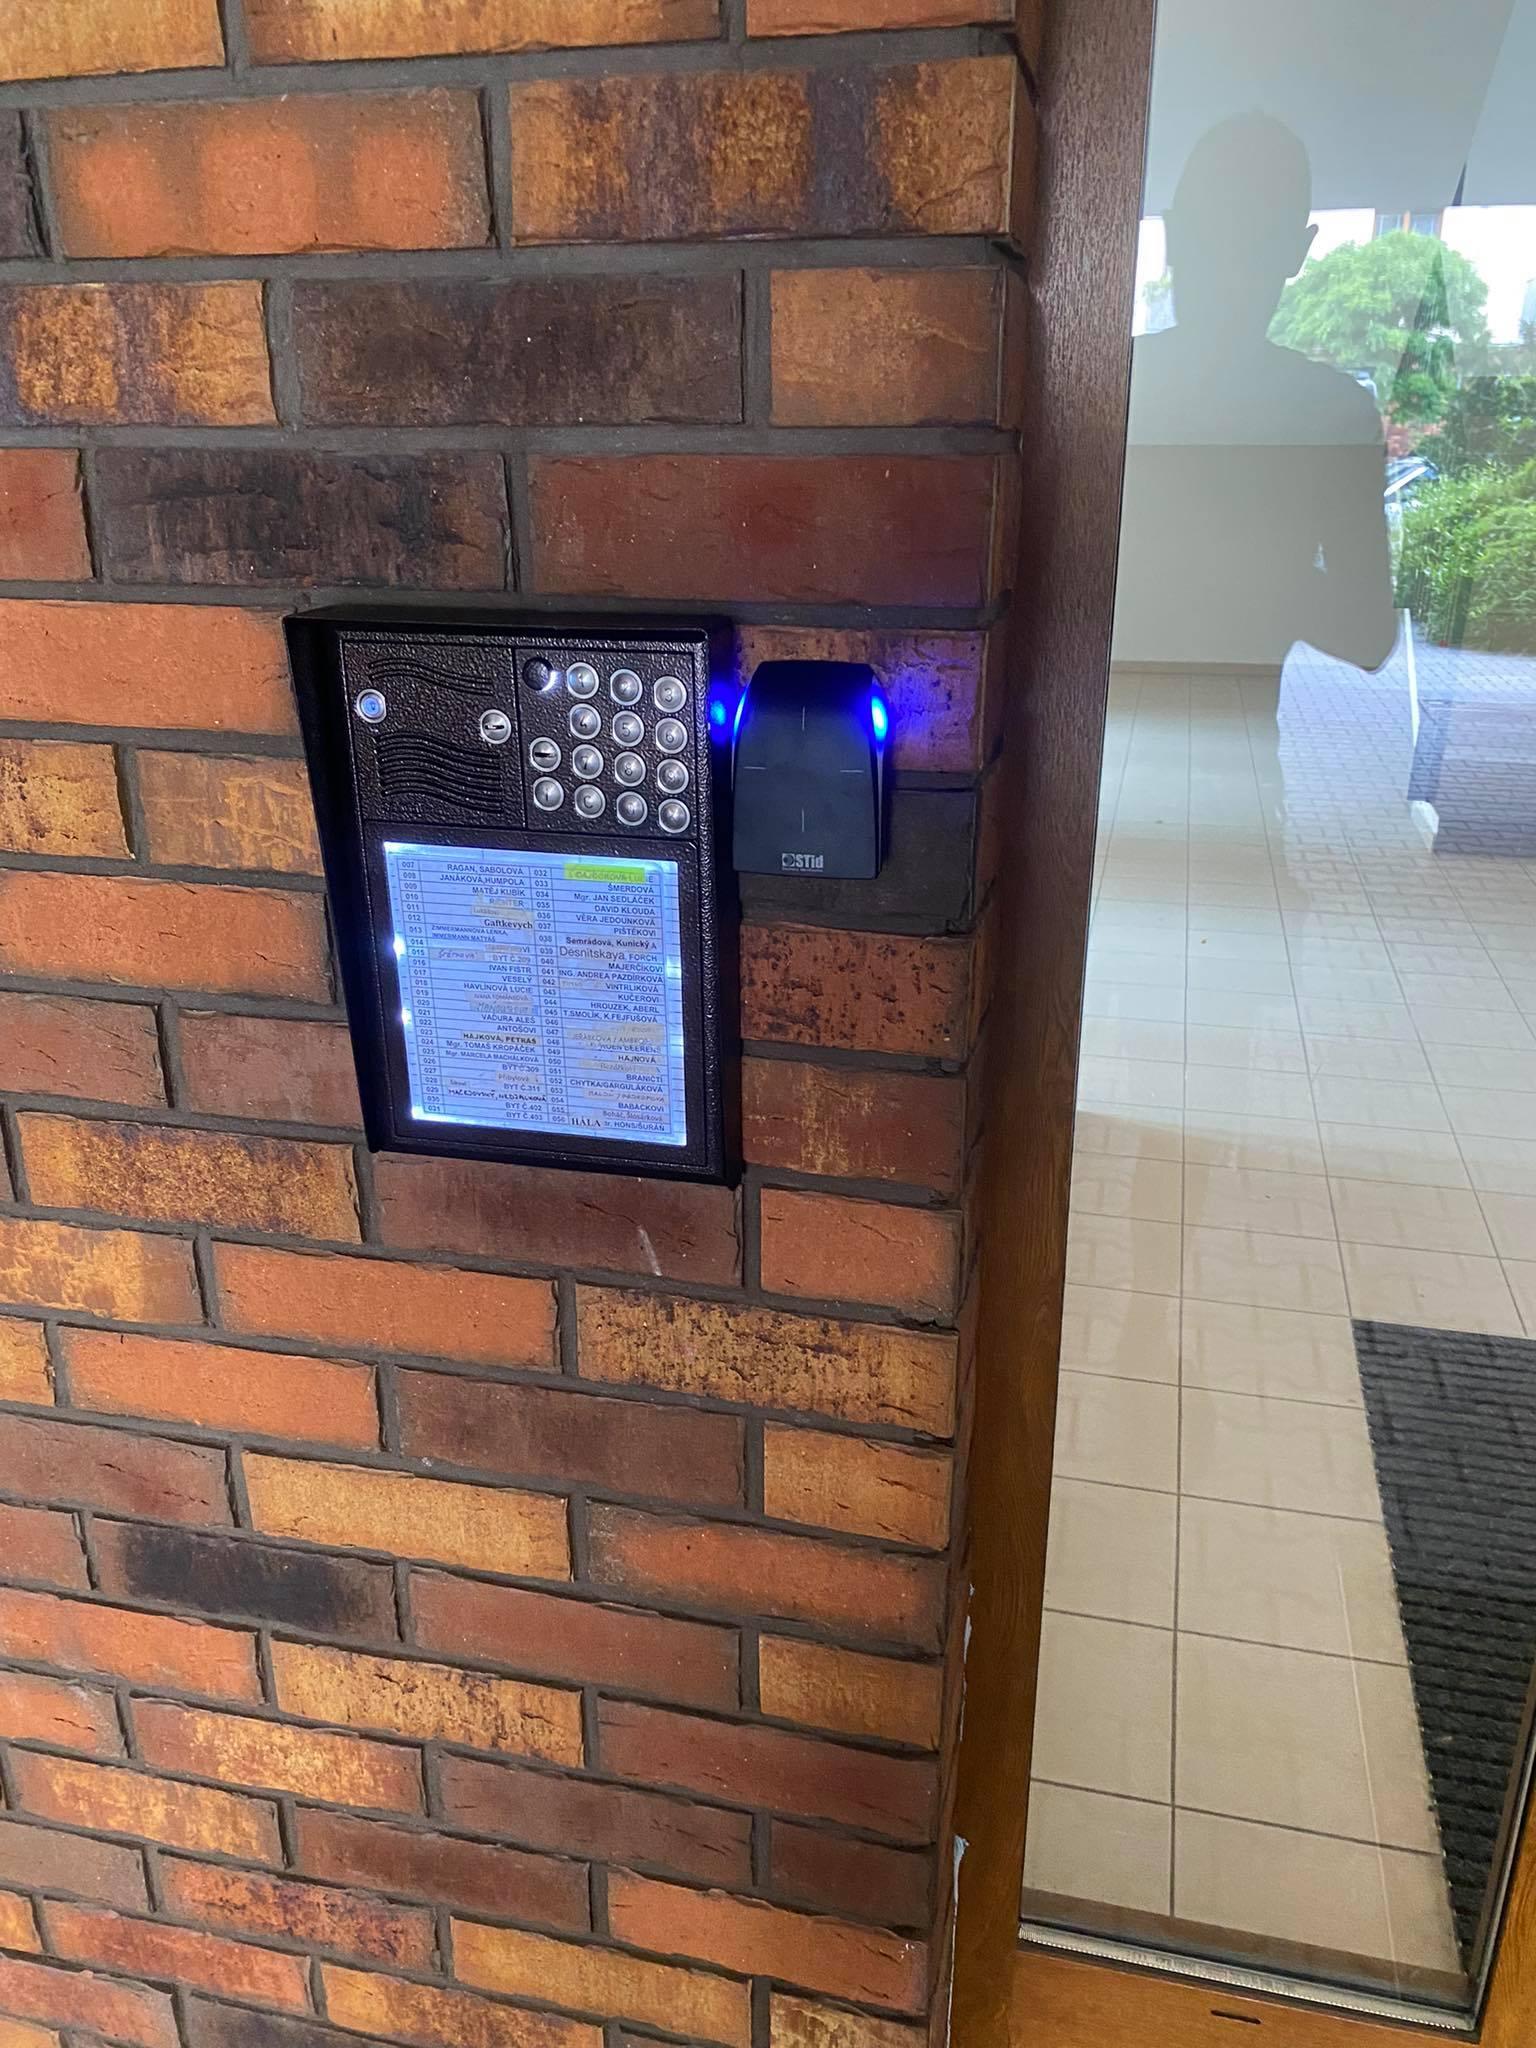 Čtečka NFC a bluetooth